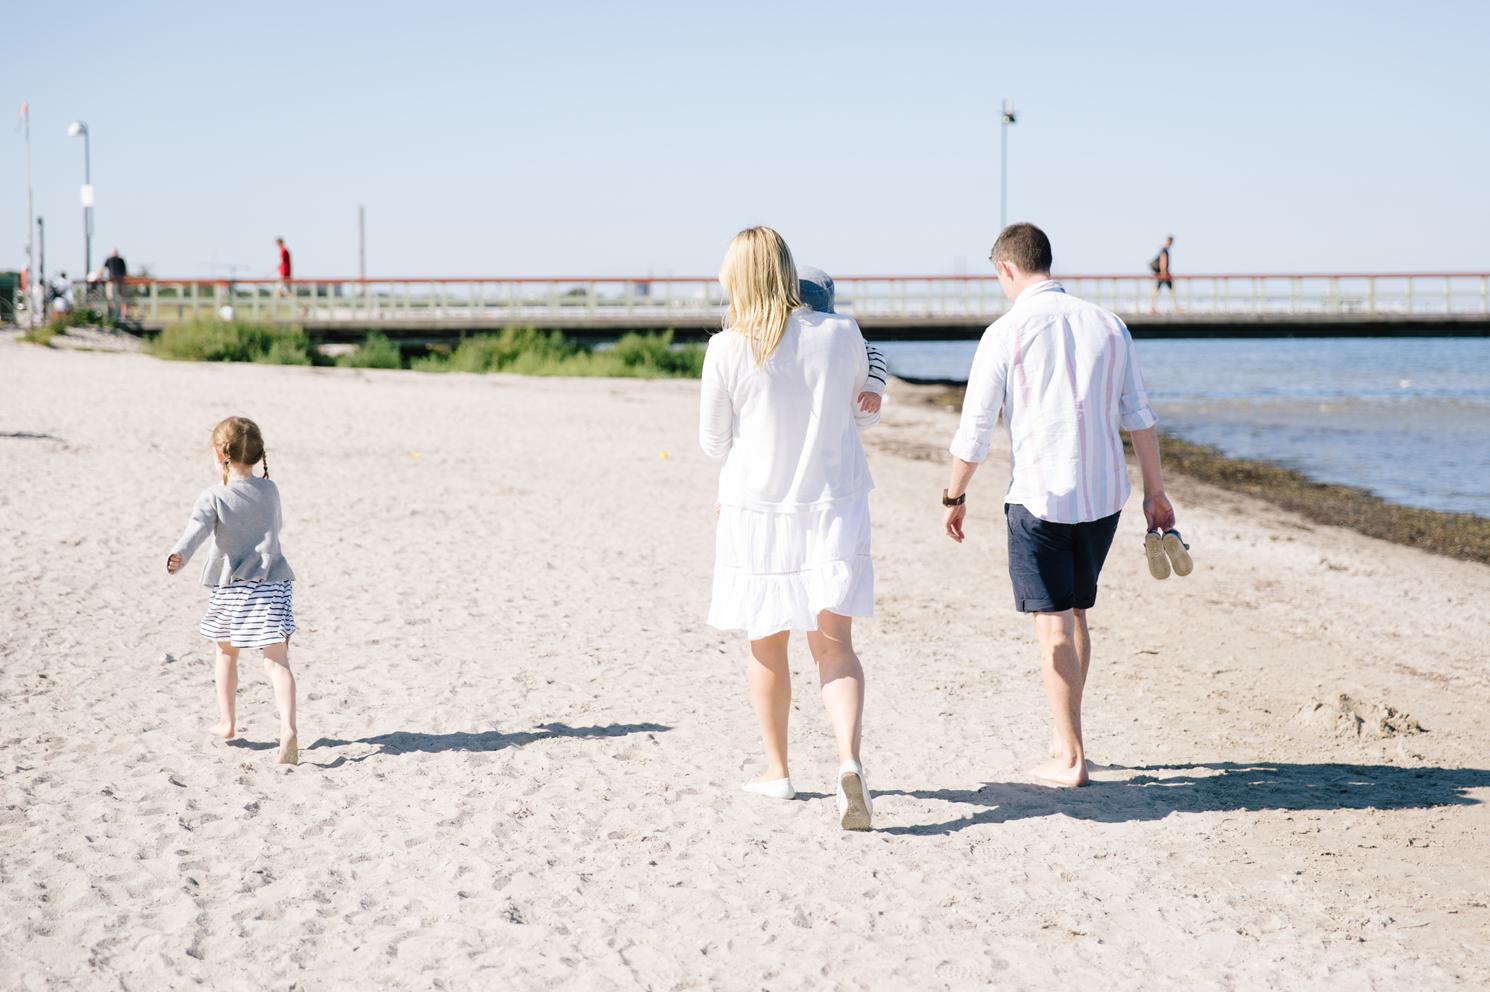 familjefotografering-malmo-kallbadhuset-maria-o-photo-lek-gladje-karlek-11